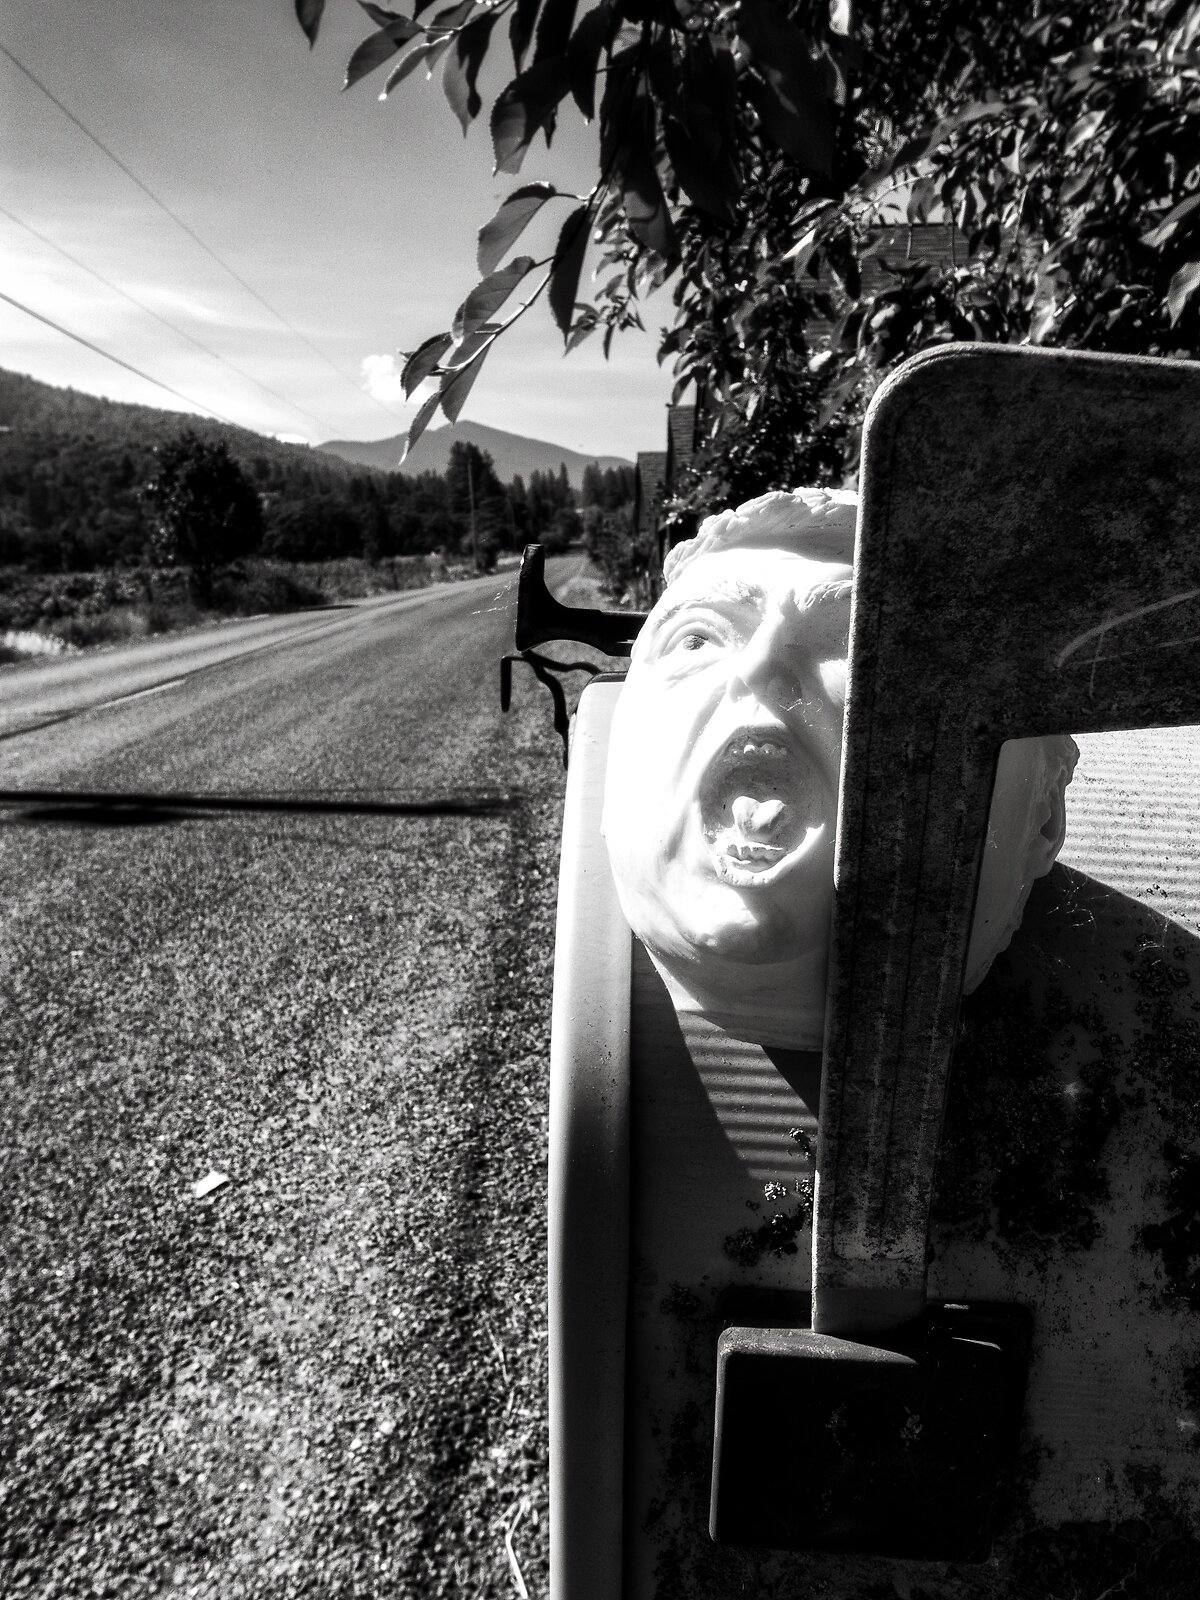 GRDii_May26_Trump_mailbox(SilverEfex).jpg